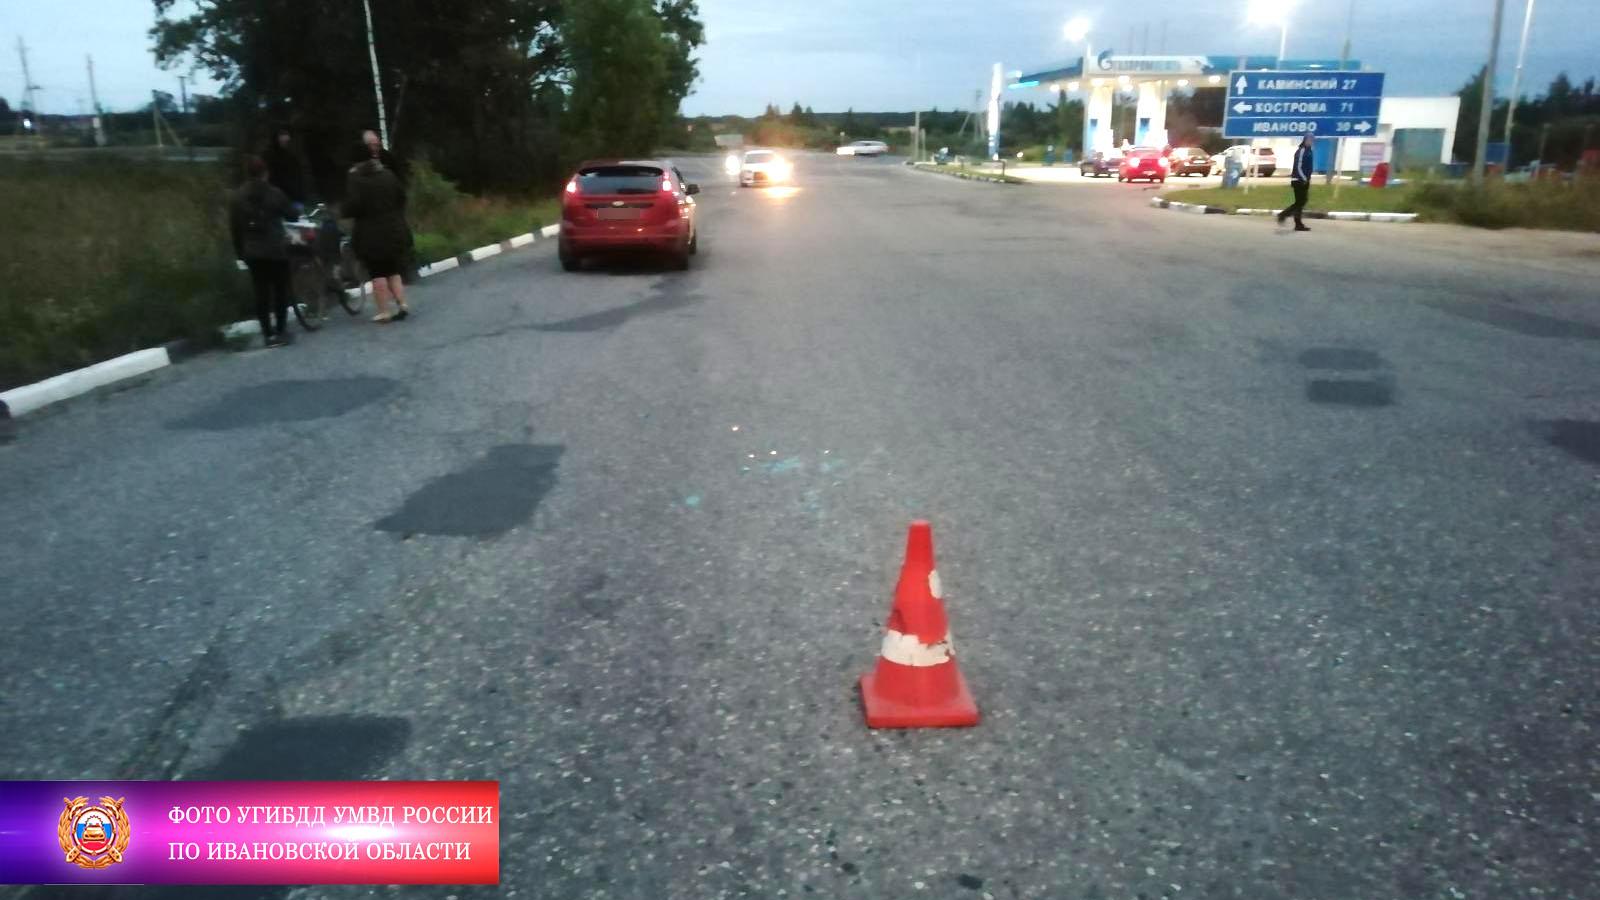 В Фурманове пенсионерке на велосипеде в ДТП разбили лицо и составили протокол